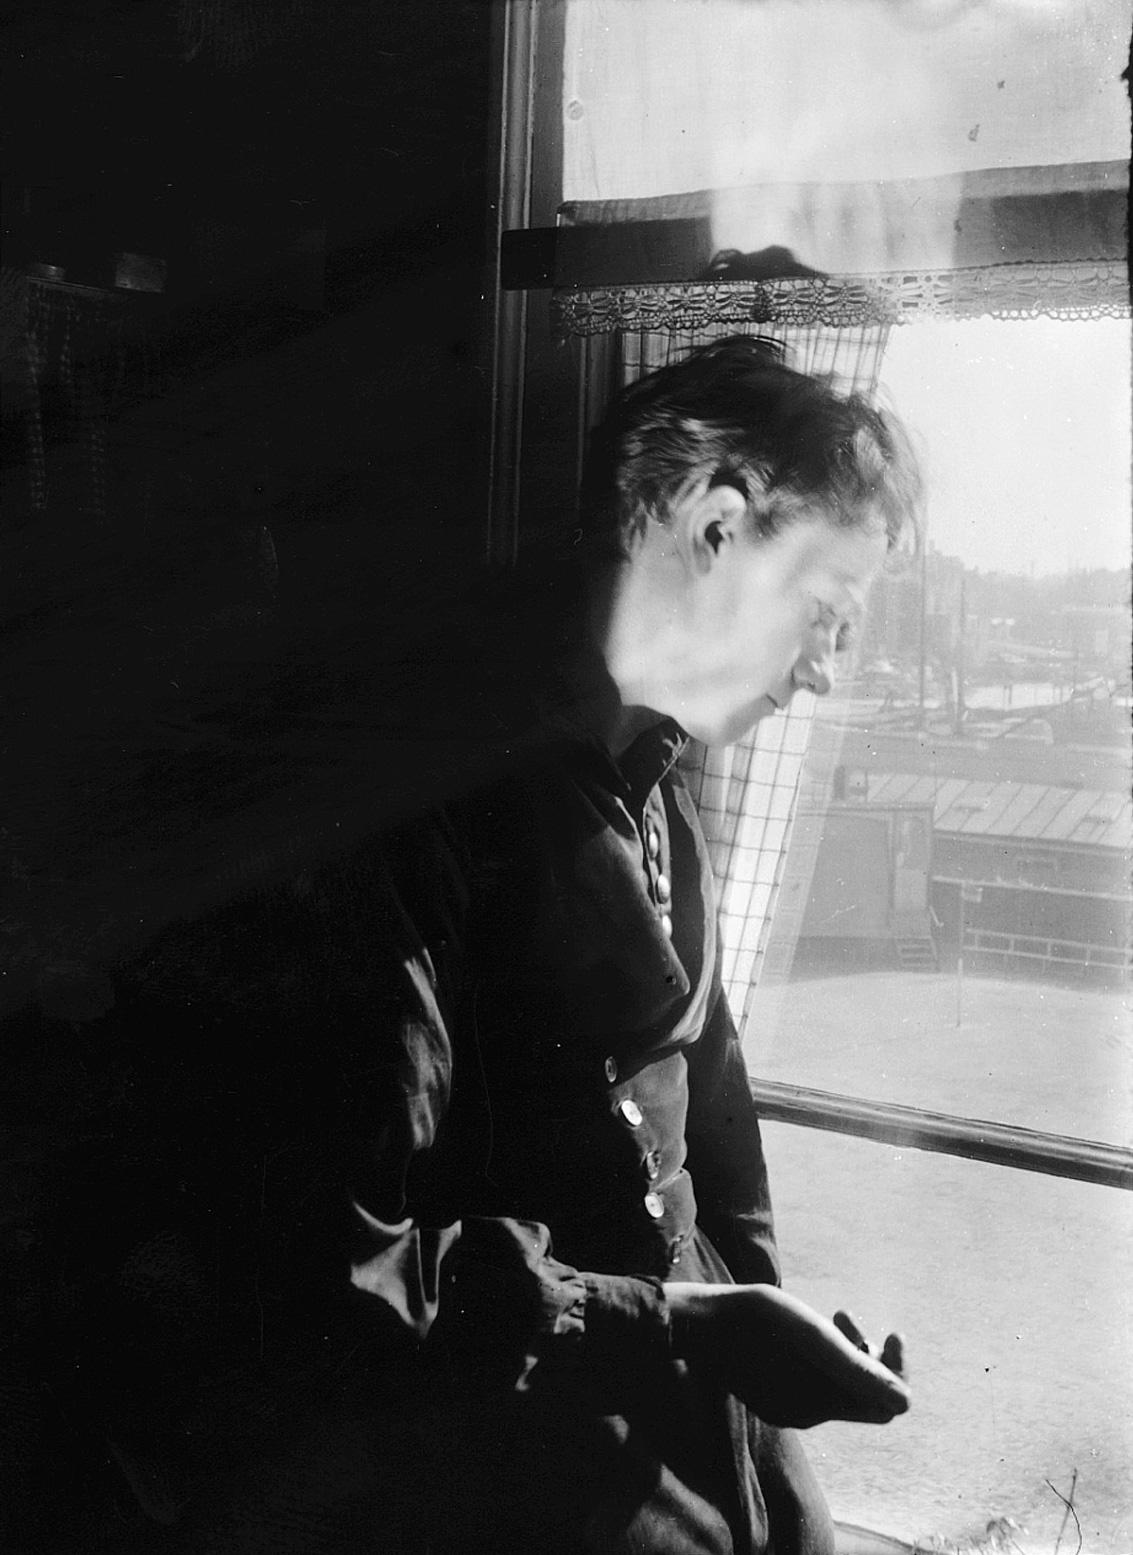 Melle schilder | zelfportret , glasnegatief op fotopapier